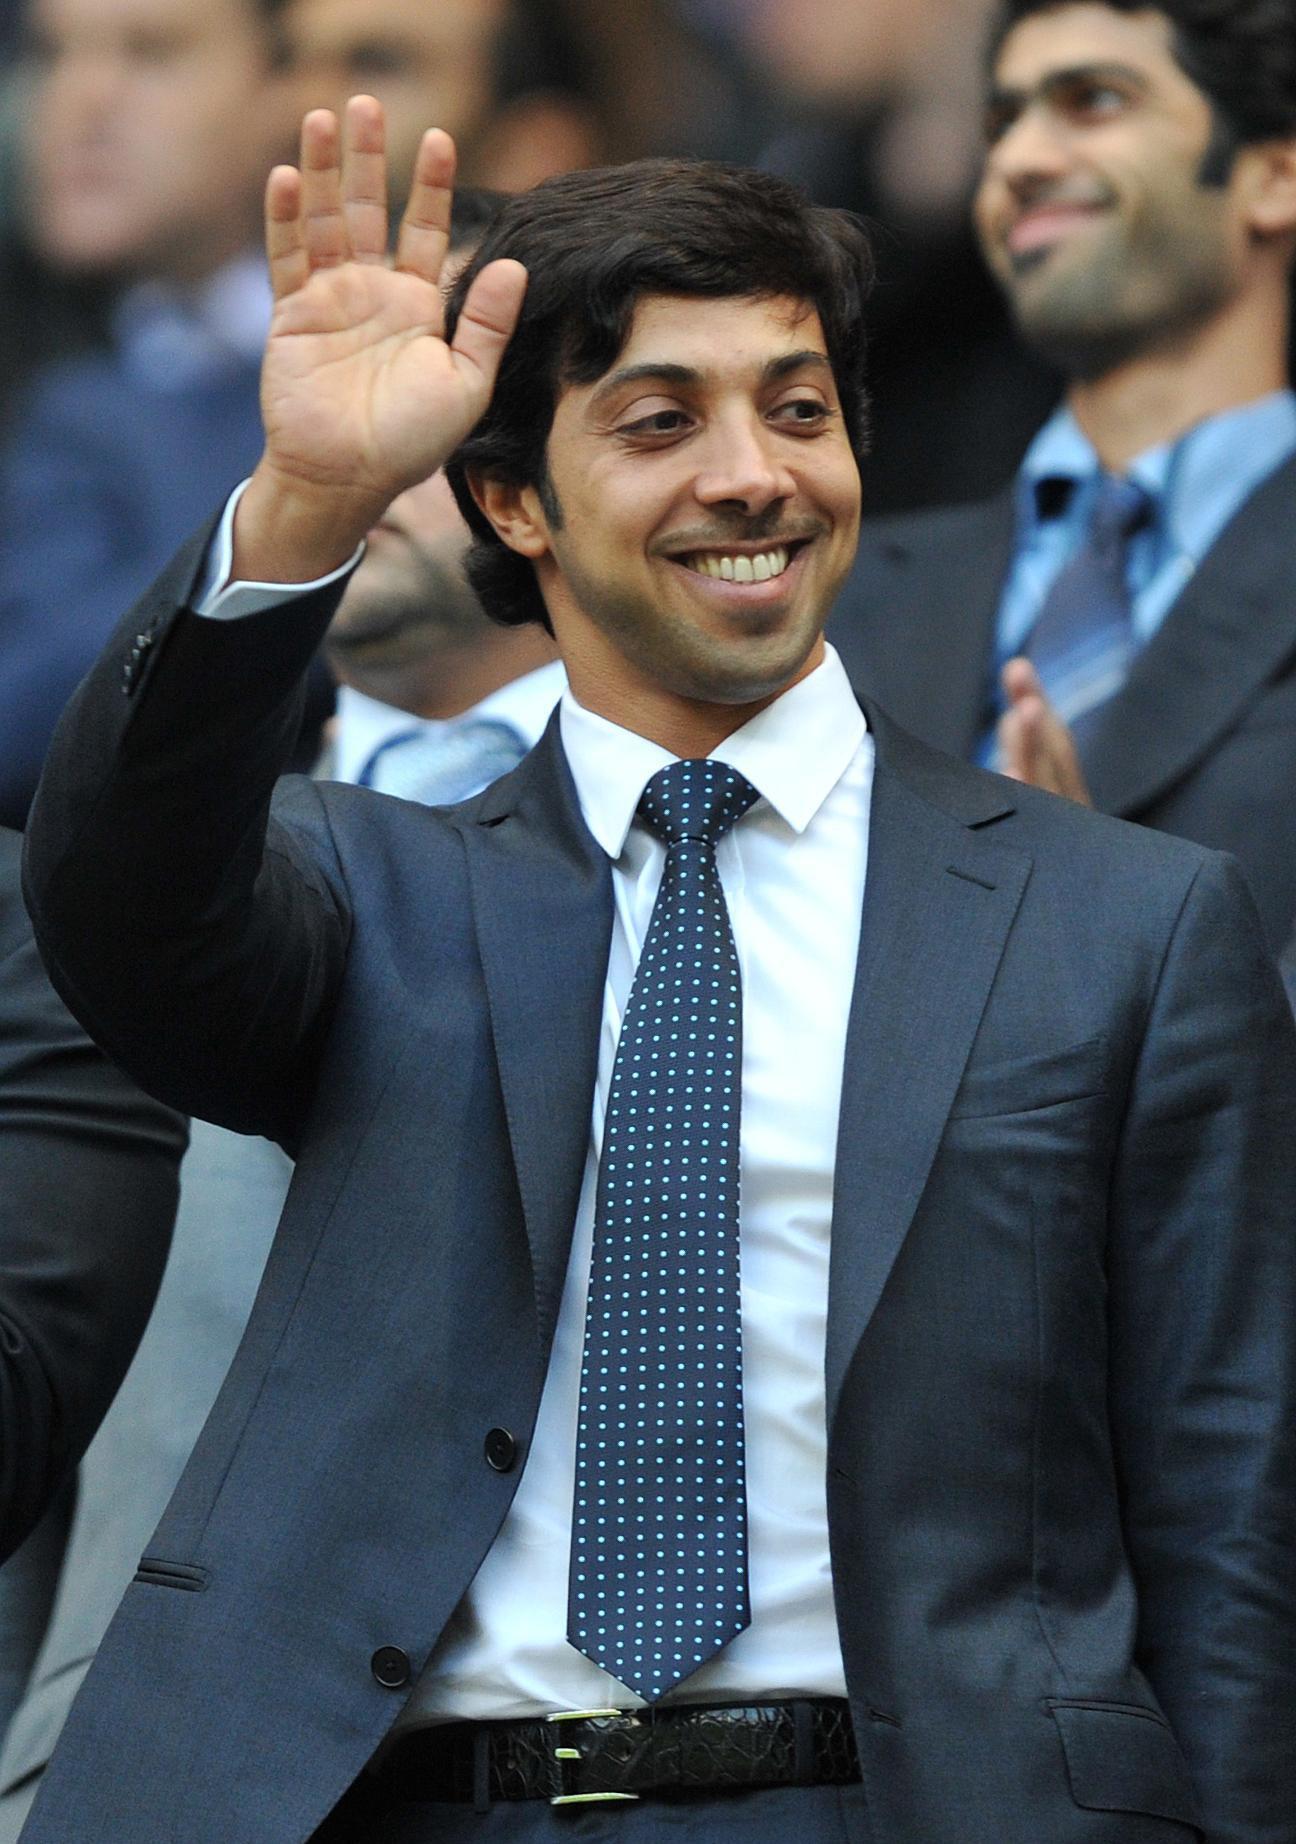 Sheikh Mansour owns the £400m Topaz